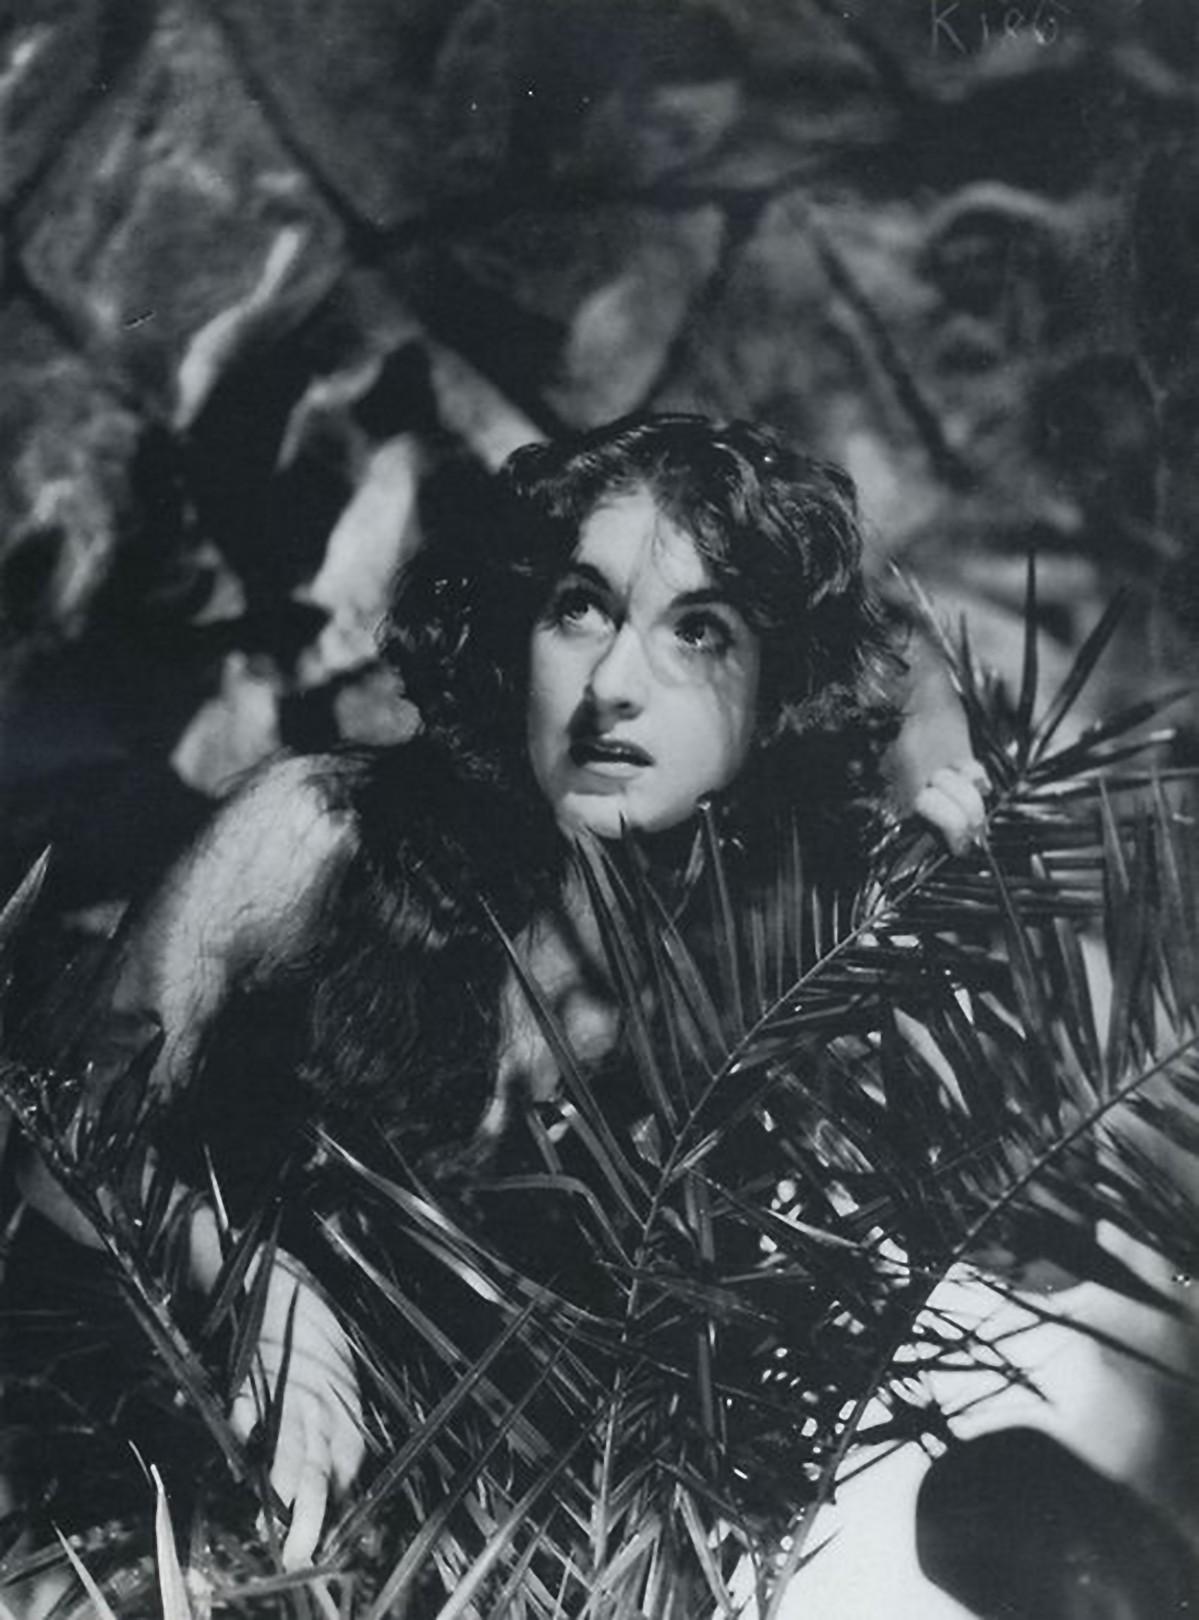 Elio Luxardo- Giungla Luxardo Mazzota fotografia L'italica Bellezza Turroni (Giuseppe), 1960 Gabriele Mazzotta editore